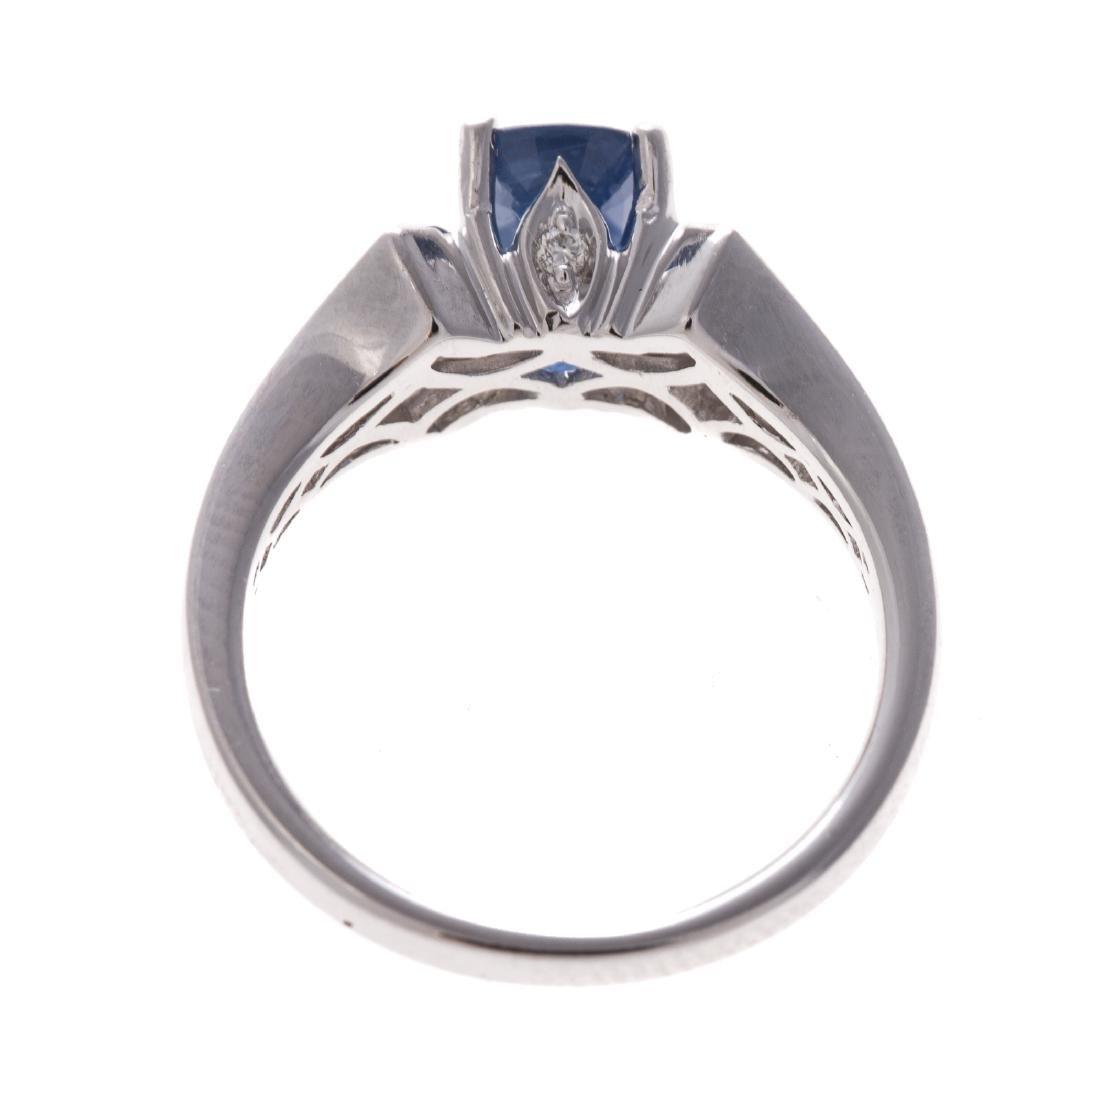 A Lady's 18K Sapphire & Diamond Ring - 3